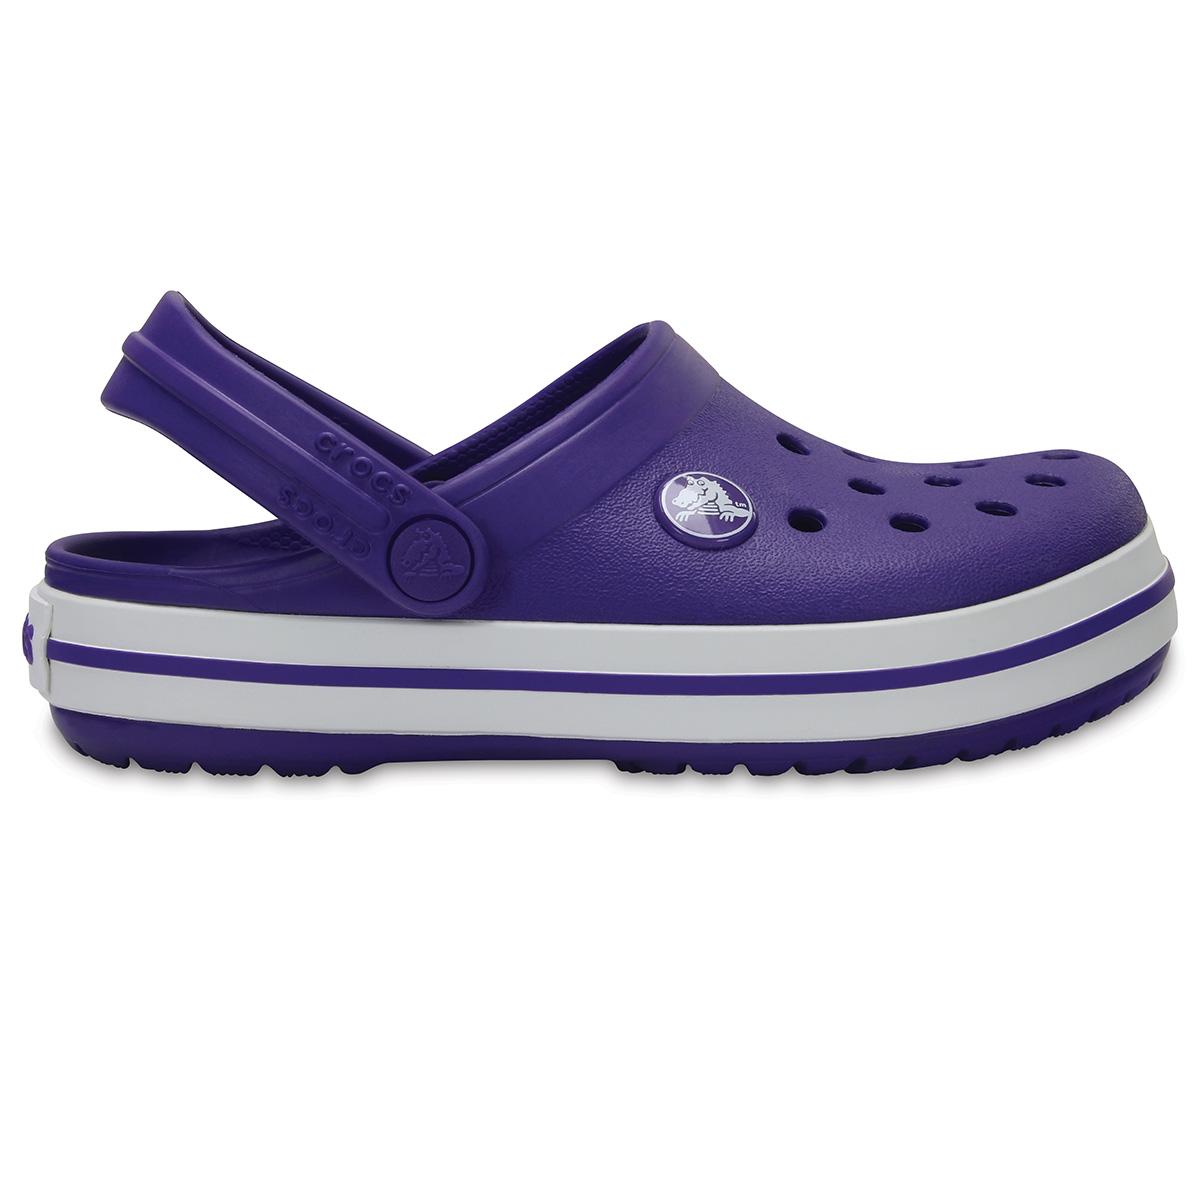 Crocs Crocband Clog K - Ultraviyole/Beyaz